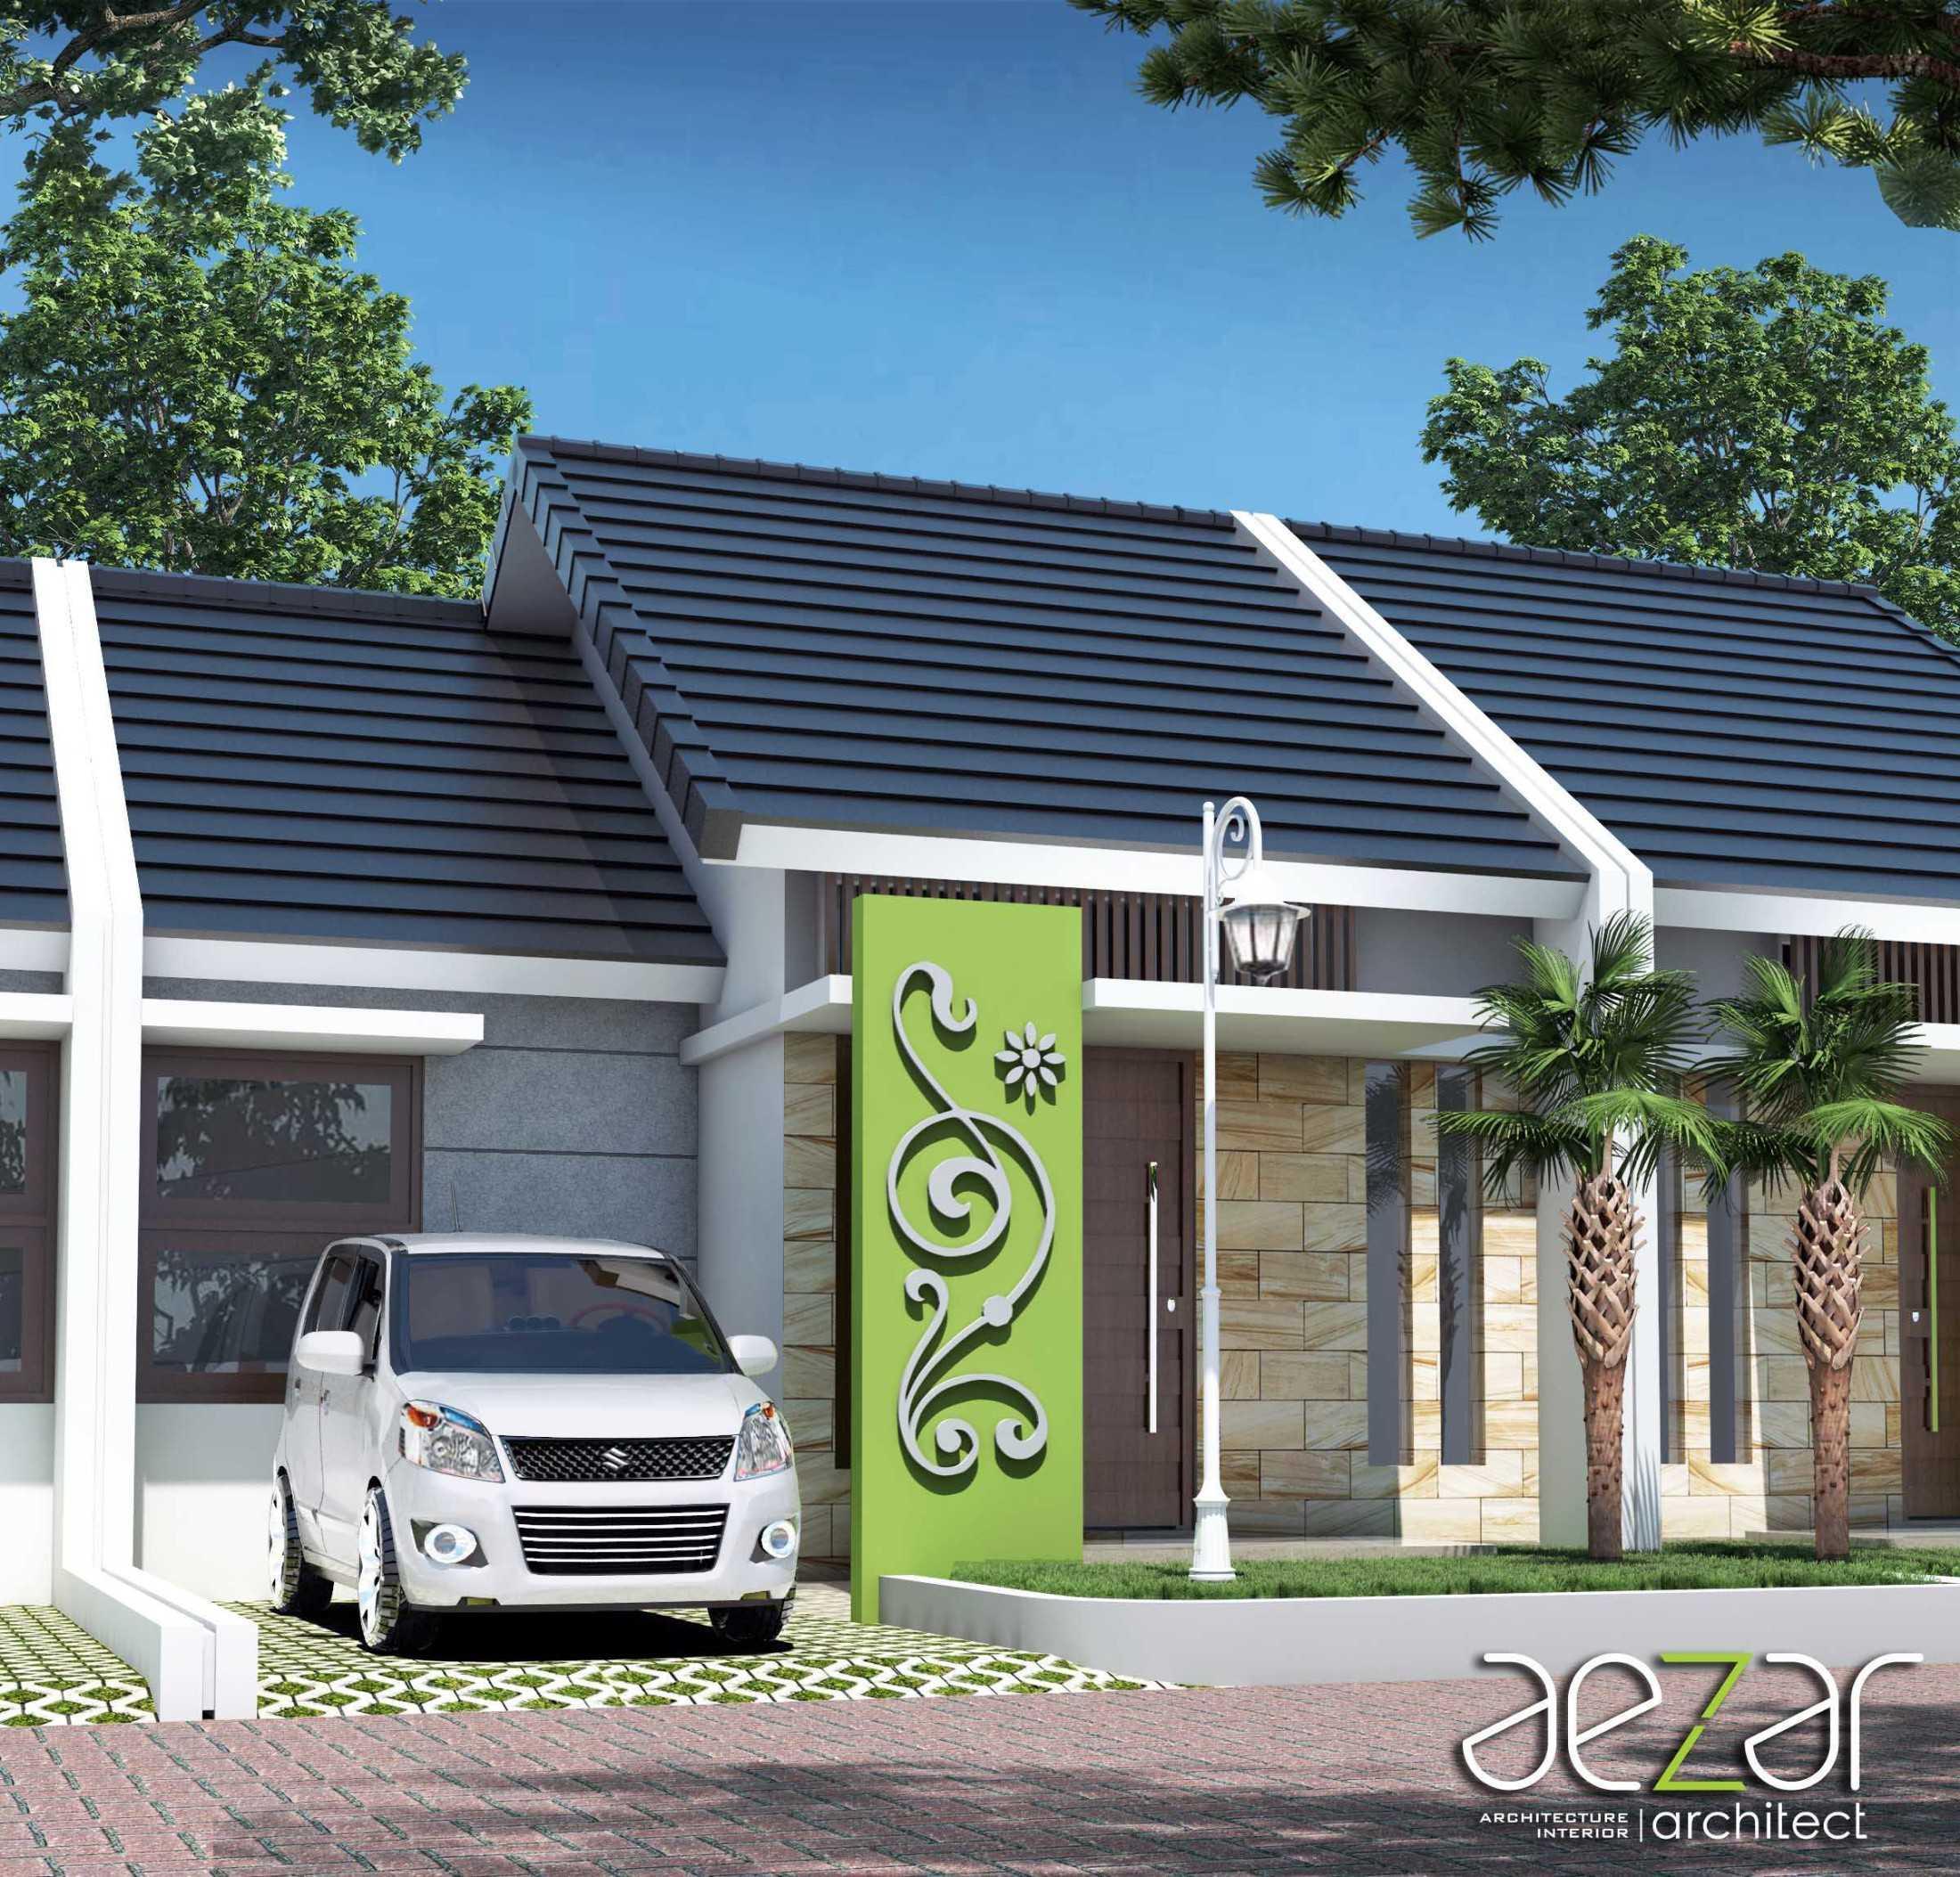 Aezar Architect Perumahan Villa Exist Sempurna Kabupaten Batang, Jawa Tengah, Indonesia Kabupaten Batang, Jawa Tengah, Indonesia Exterior View Minimalis 54482